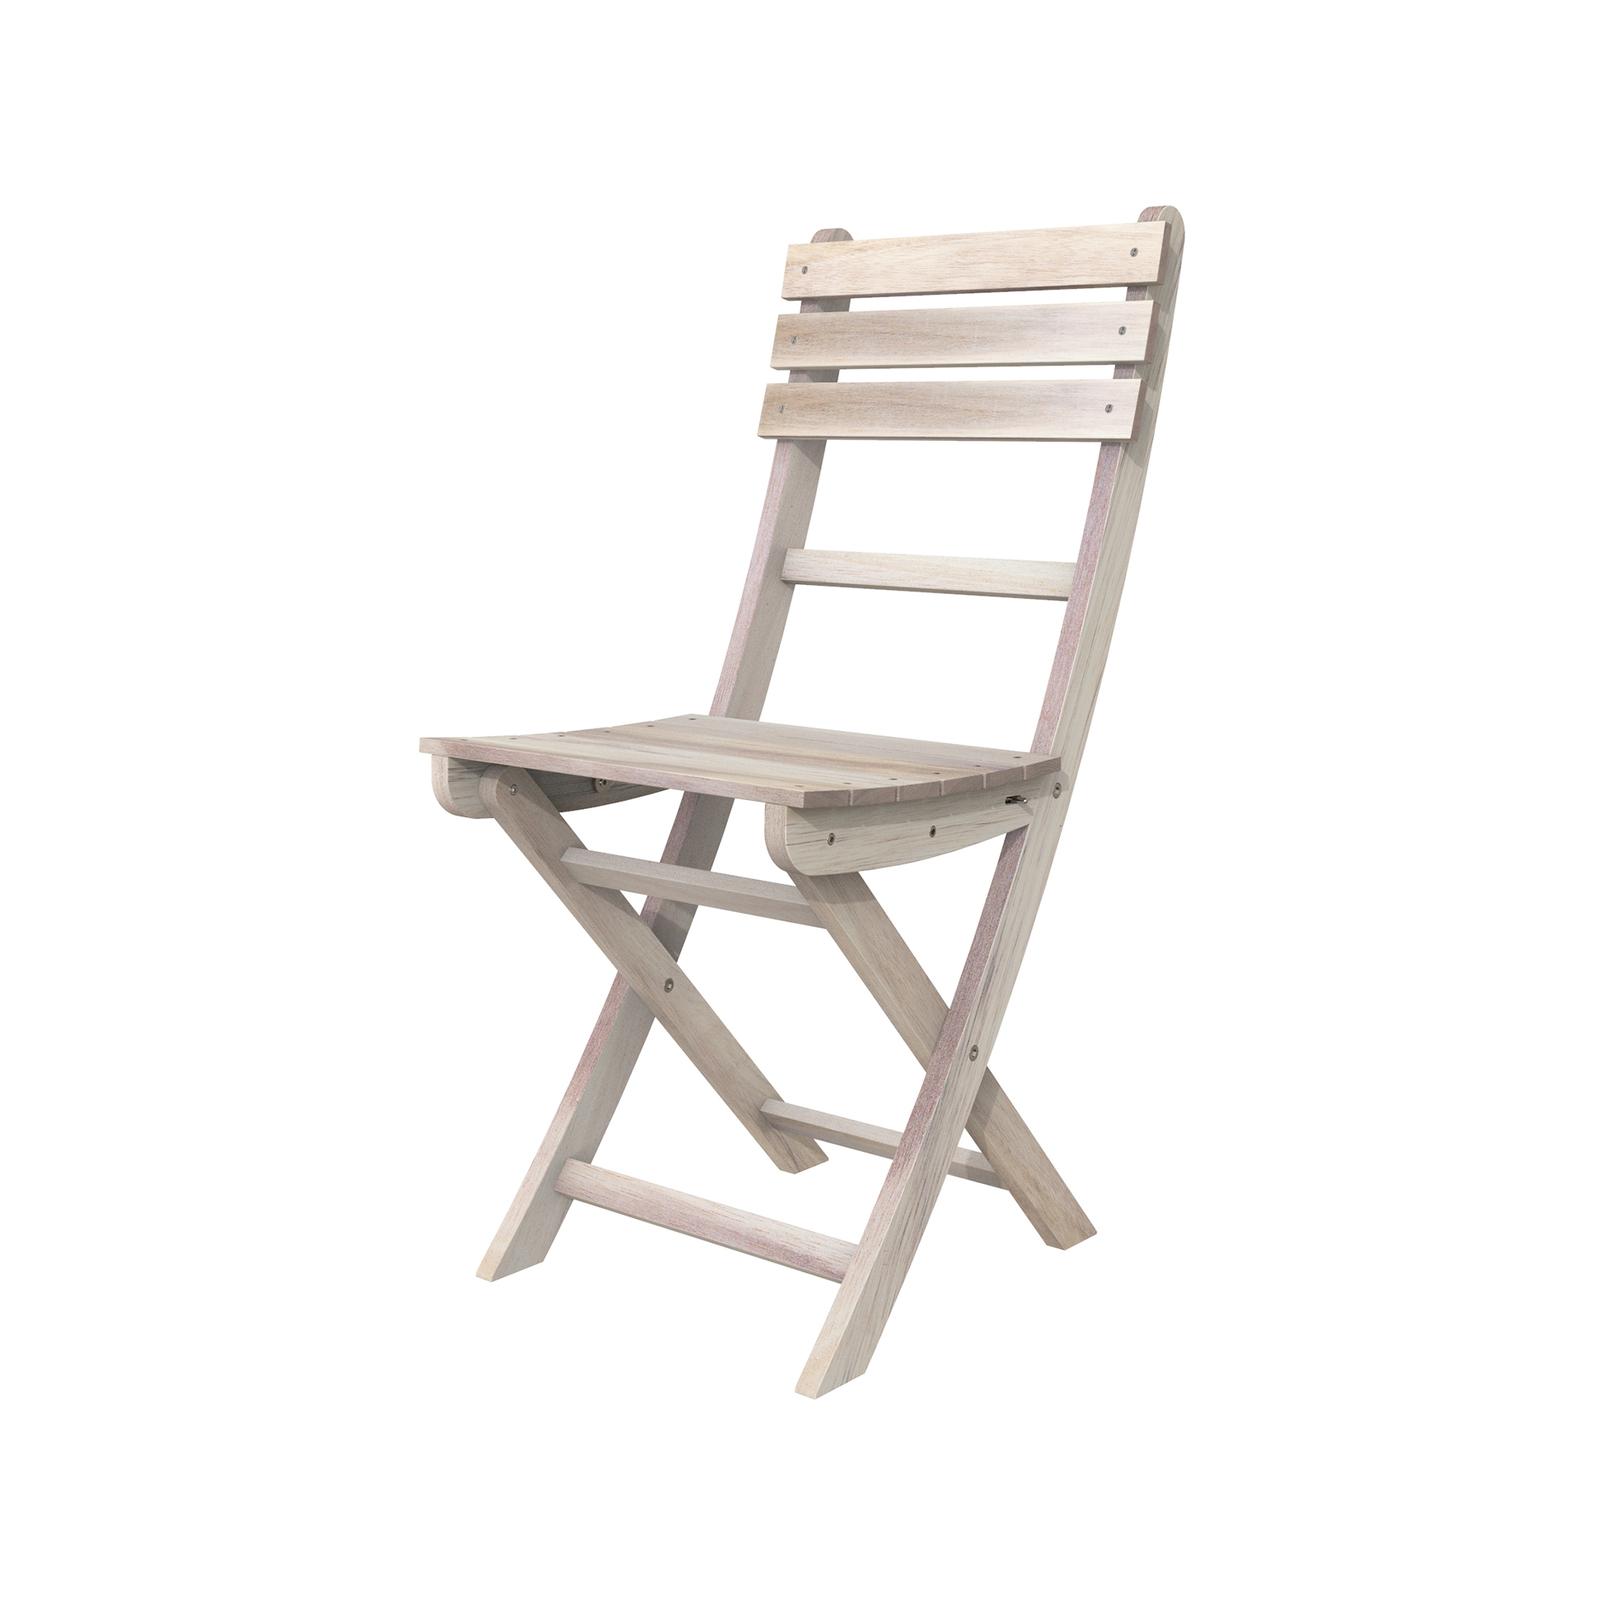 Interbuild Organic White Sofia Folding Chair - 2 Pack